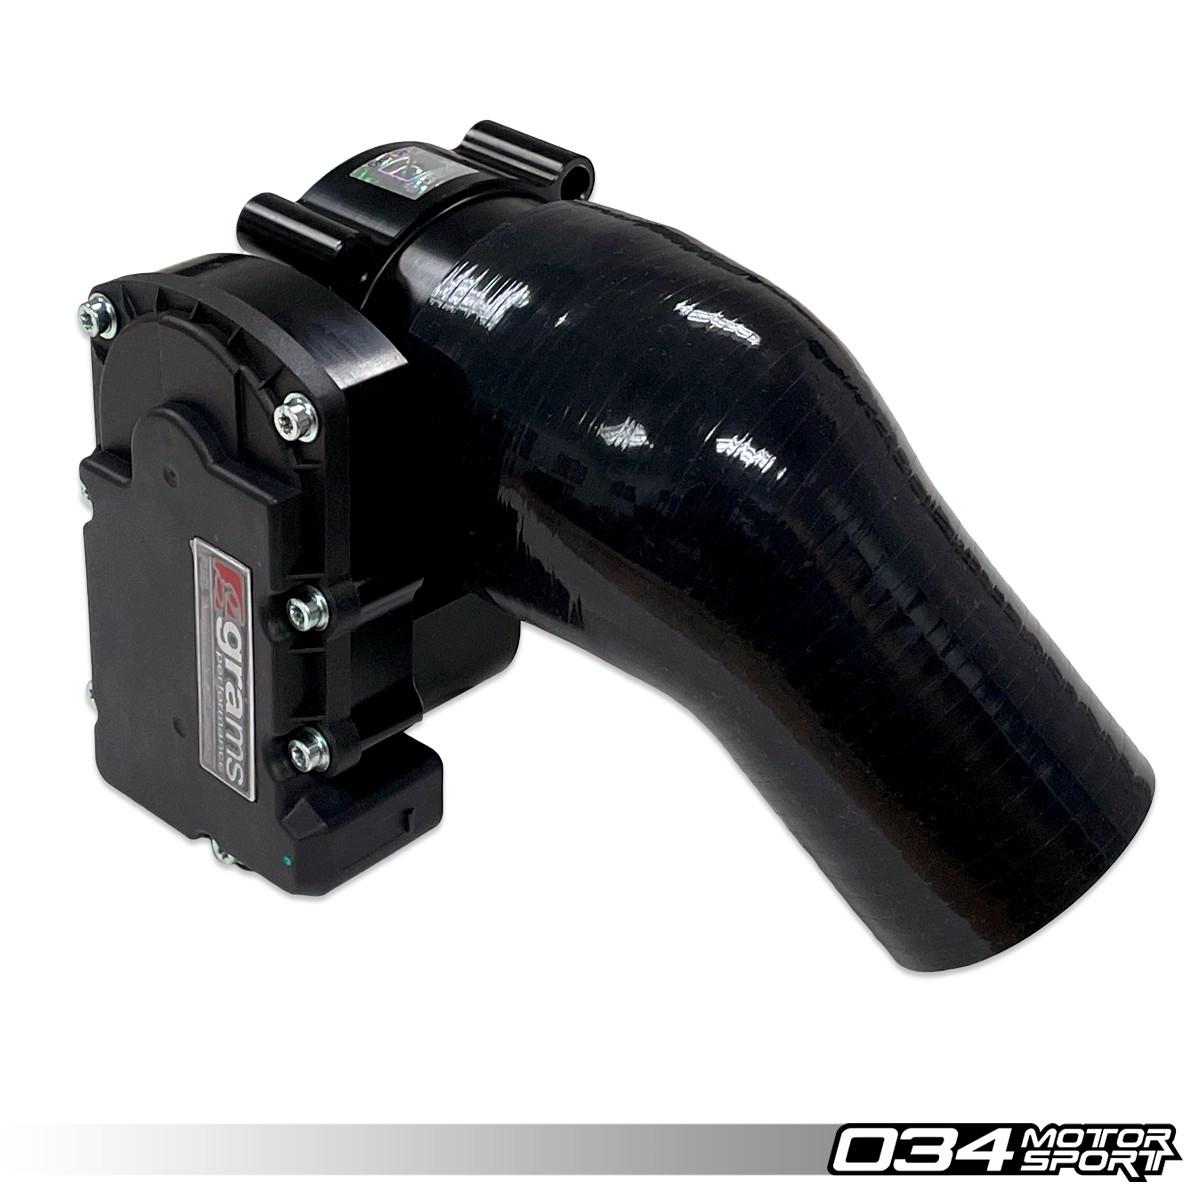 Grams 70mm DBW Throttle Body 05-16 Volkswagen Golf Mk5/6 2.0T GRM-G09-09-0710